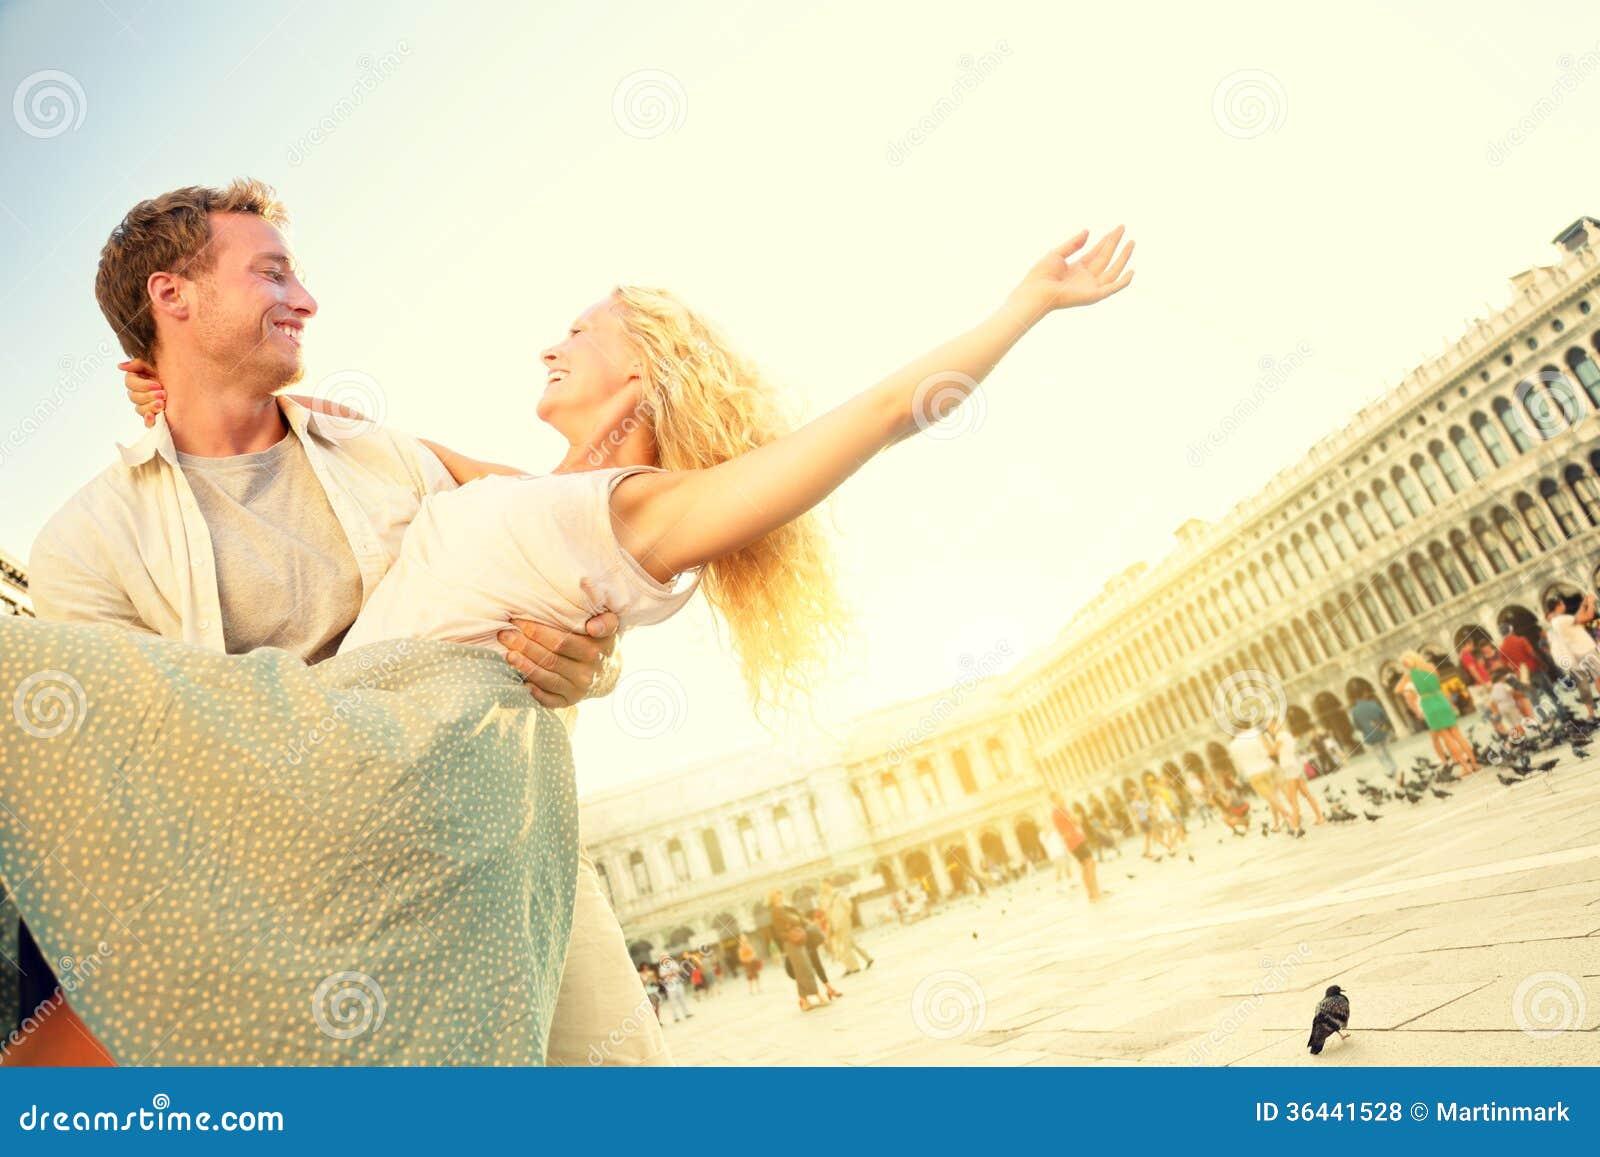 Romantic couple in love having fun in Venice